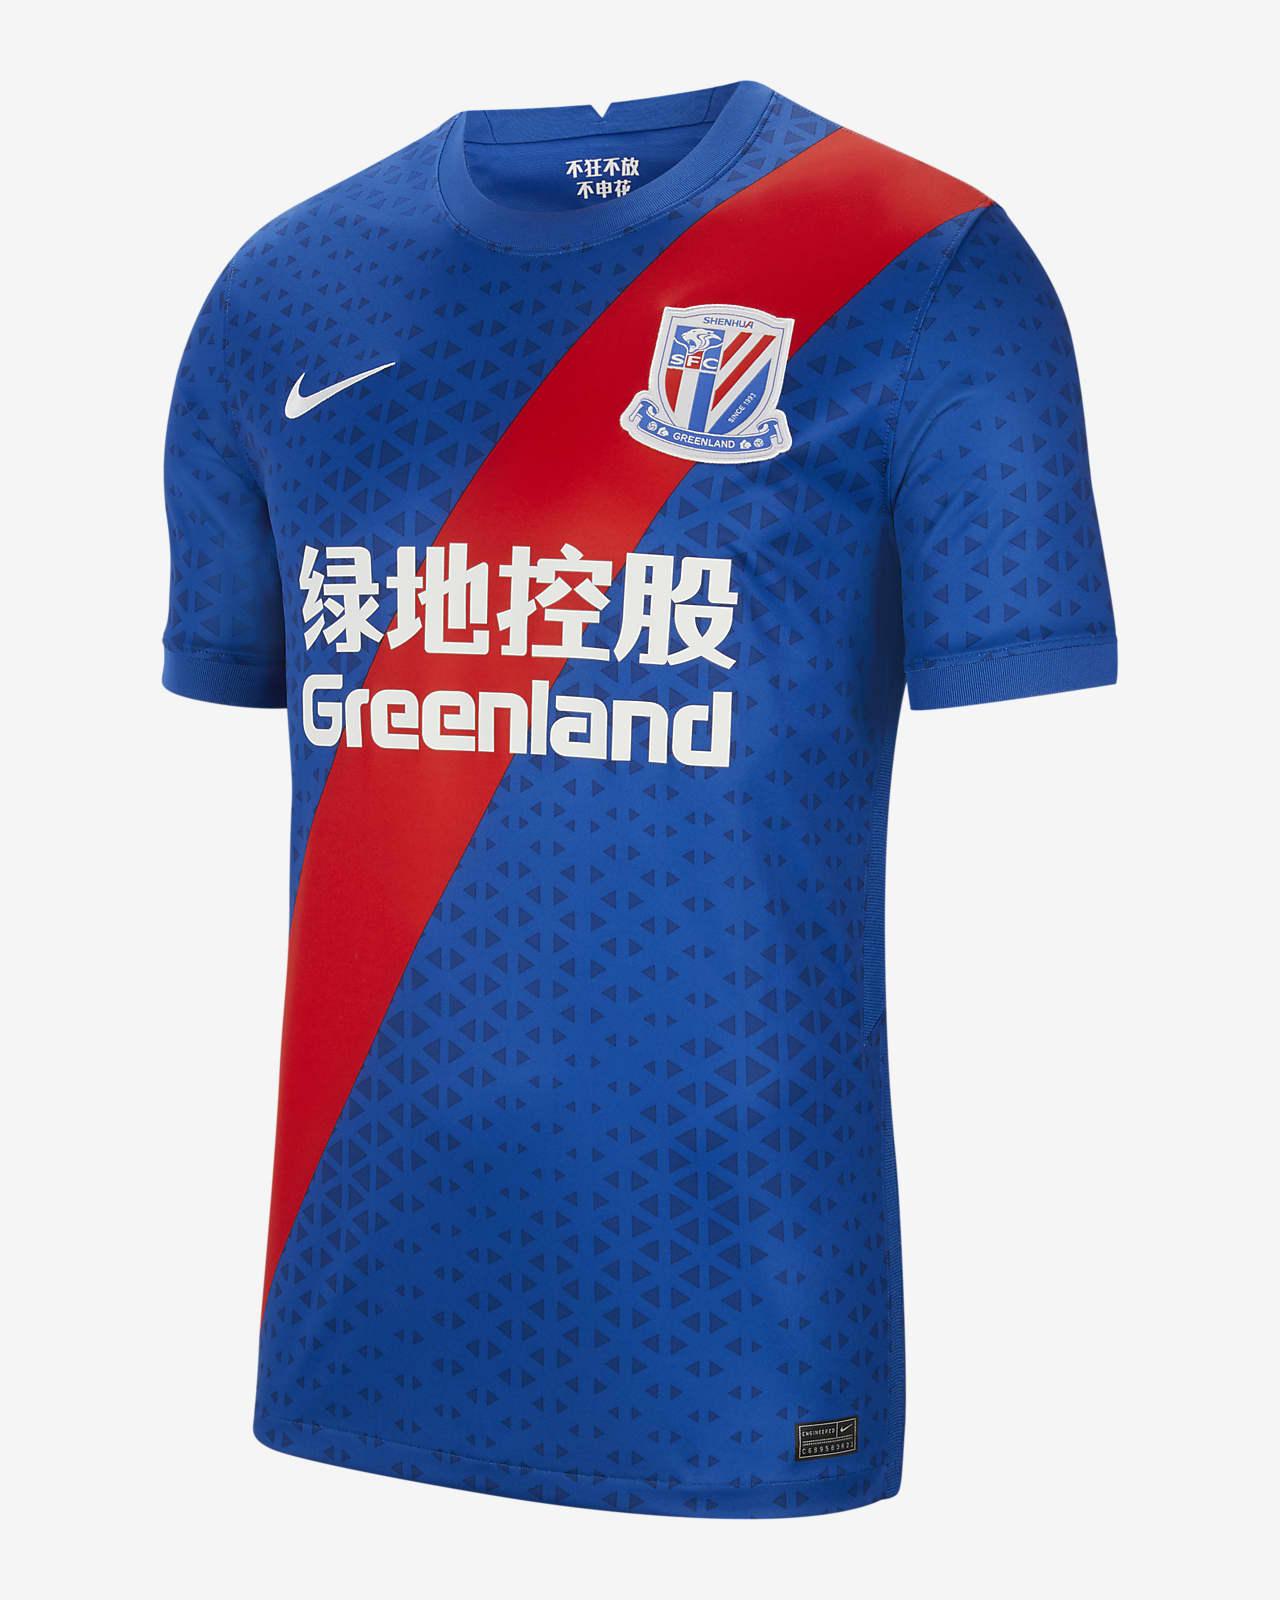 Maillot de football Shanghai Greenland Shenhua FC 2020/21 Stadium Domicile pour Homme